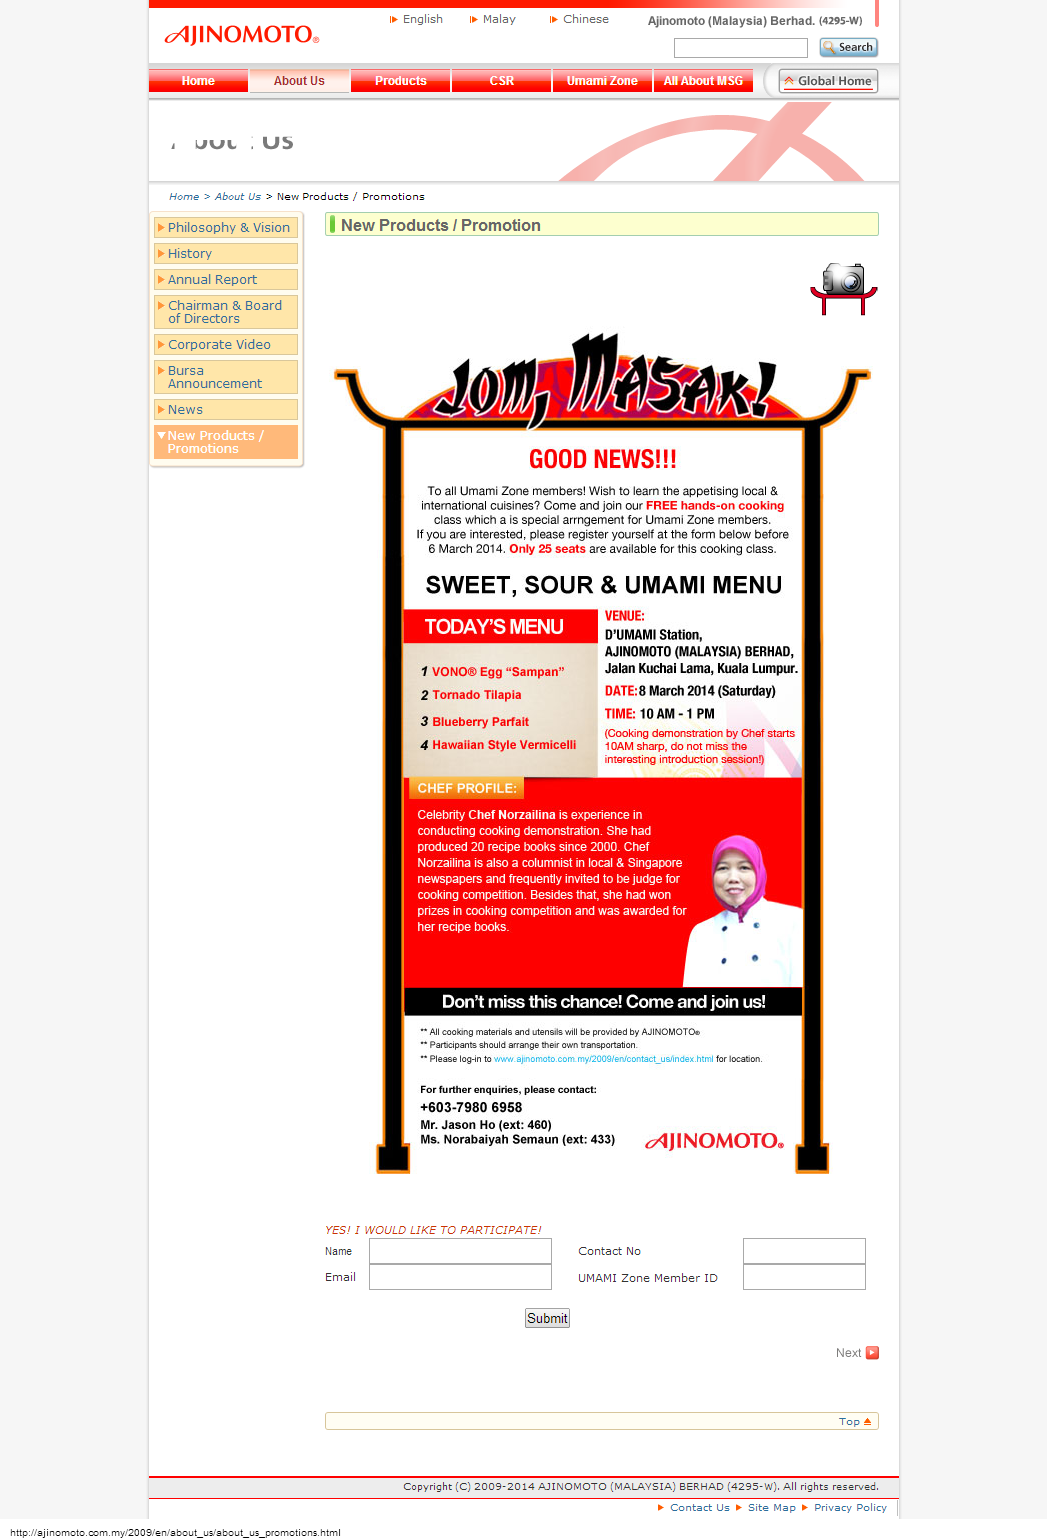 ajinomoto-news